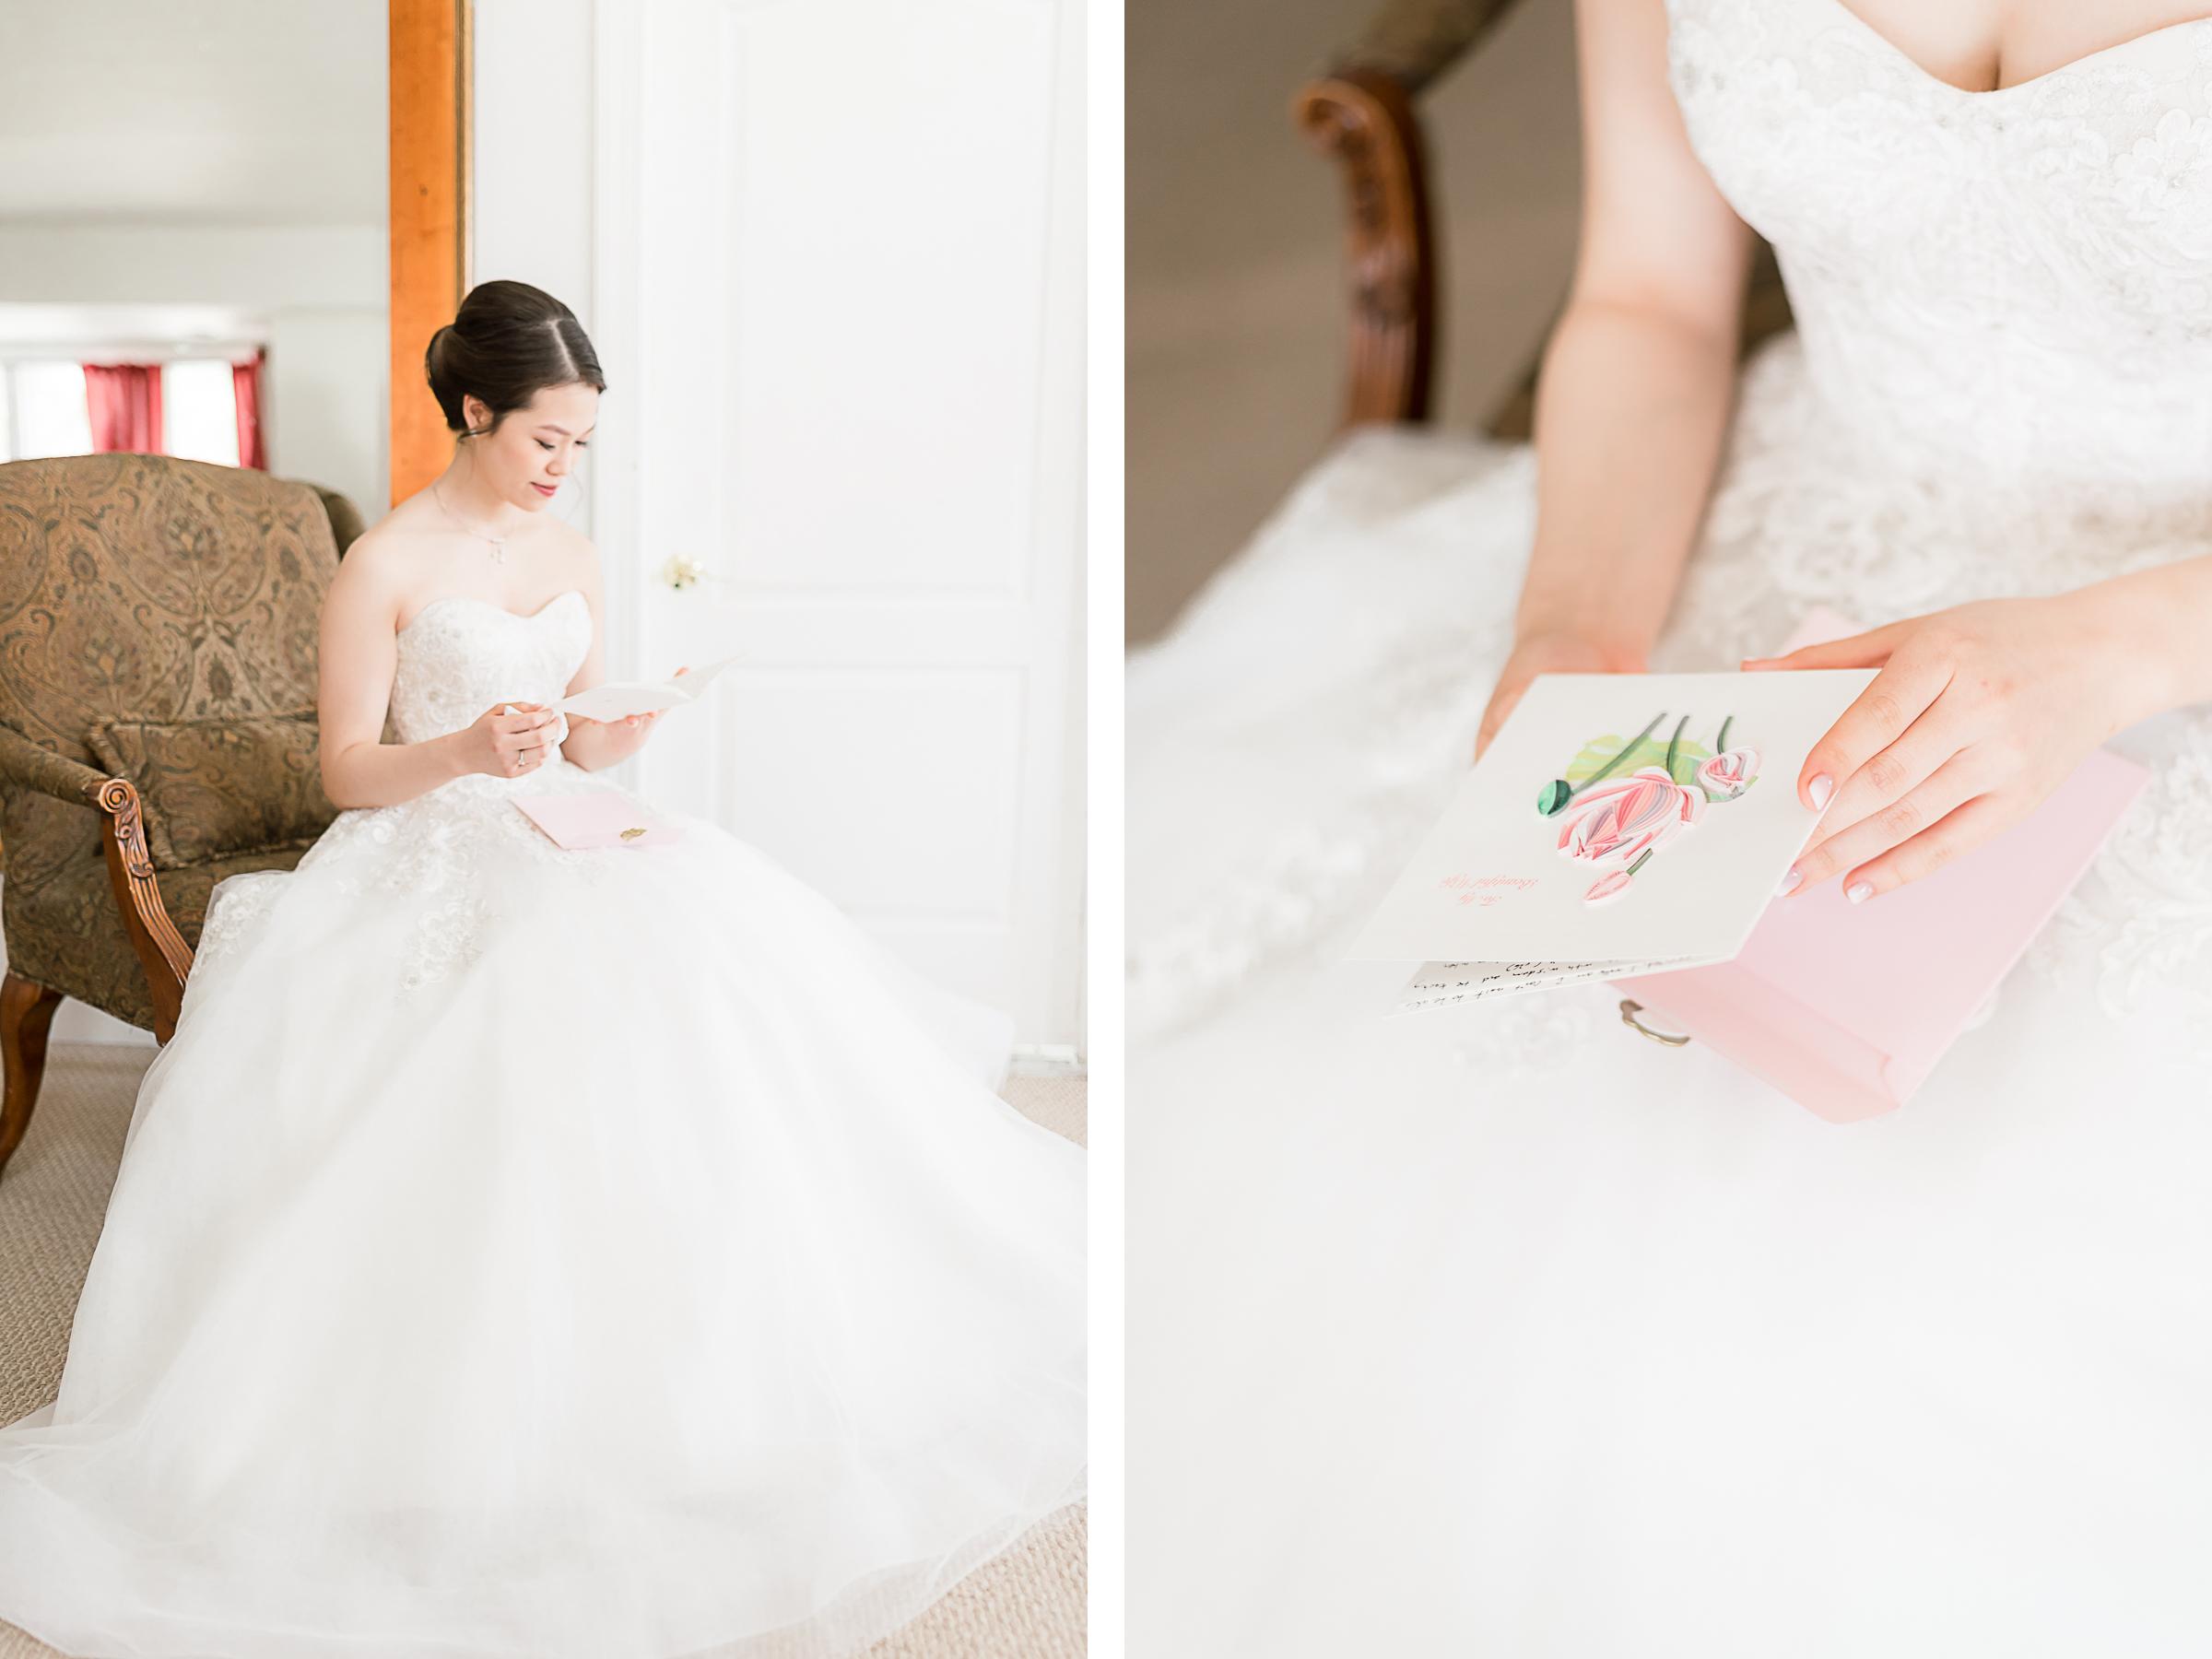 MD-Wedding-Columbia-Inn-Hollywood-Ballroom-Bridal-Party-54.jpg